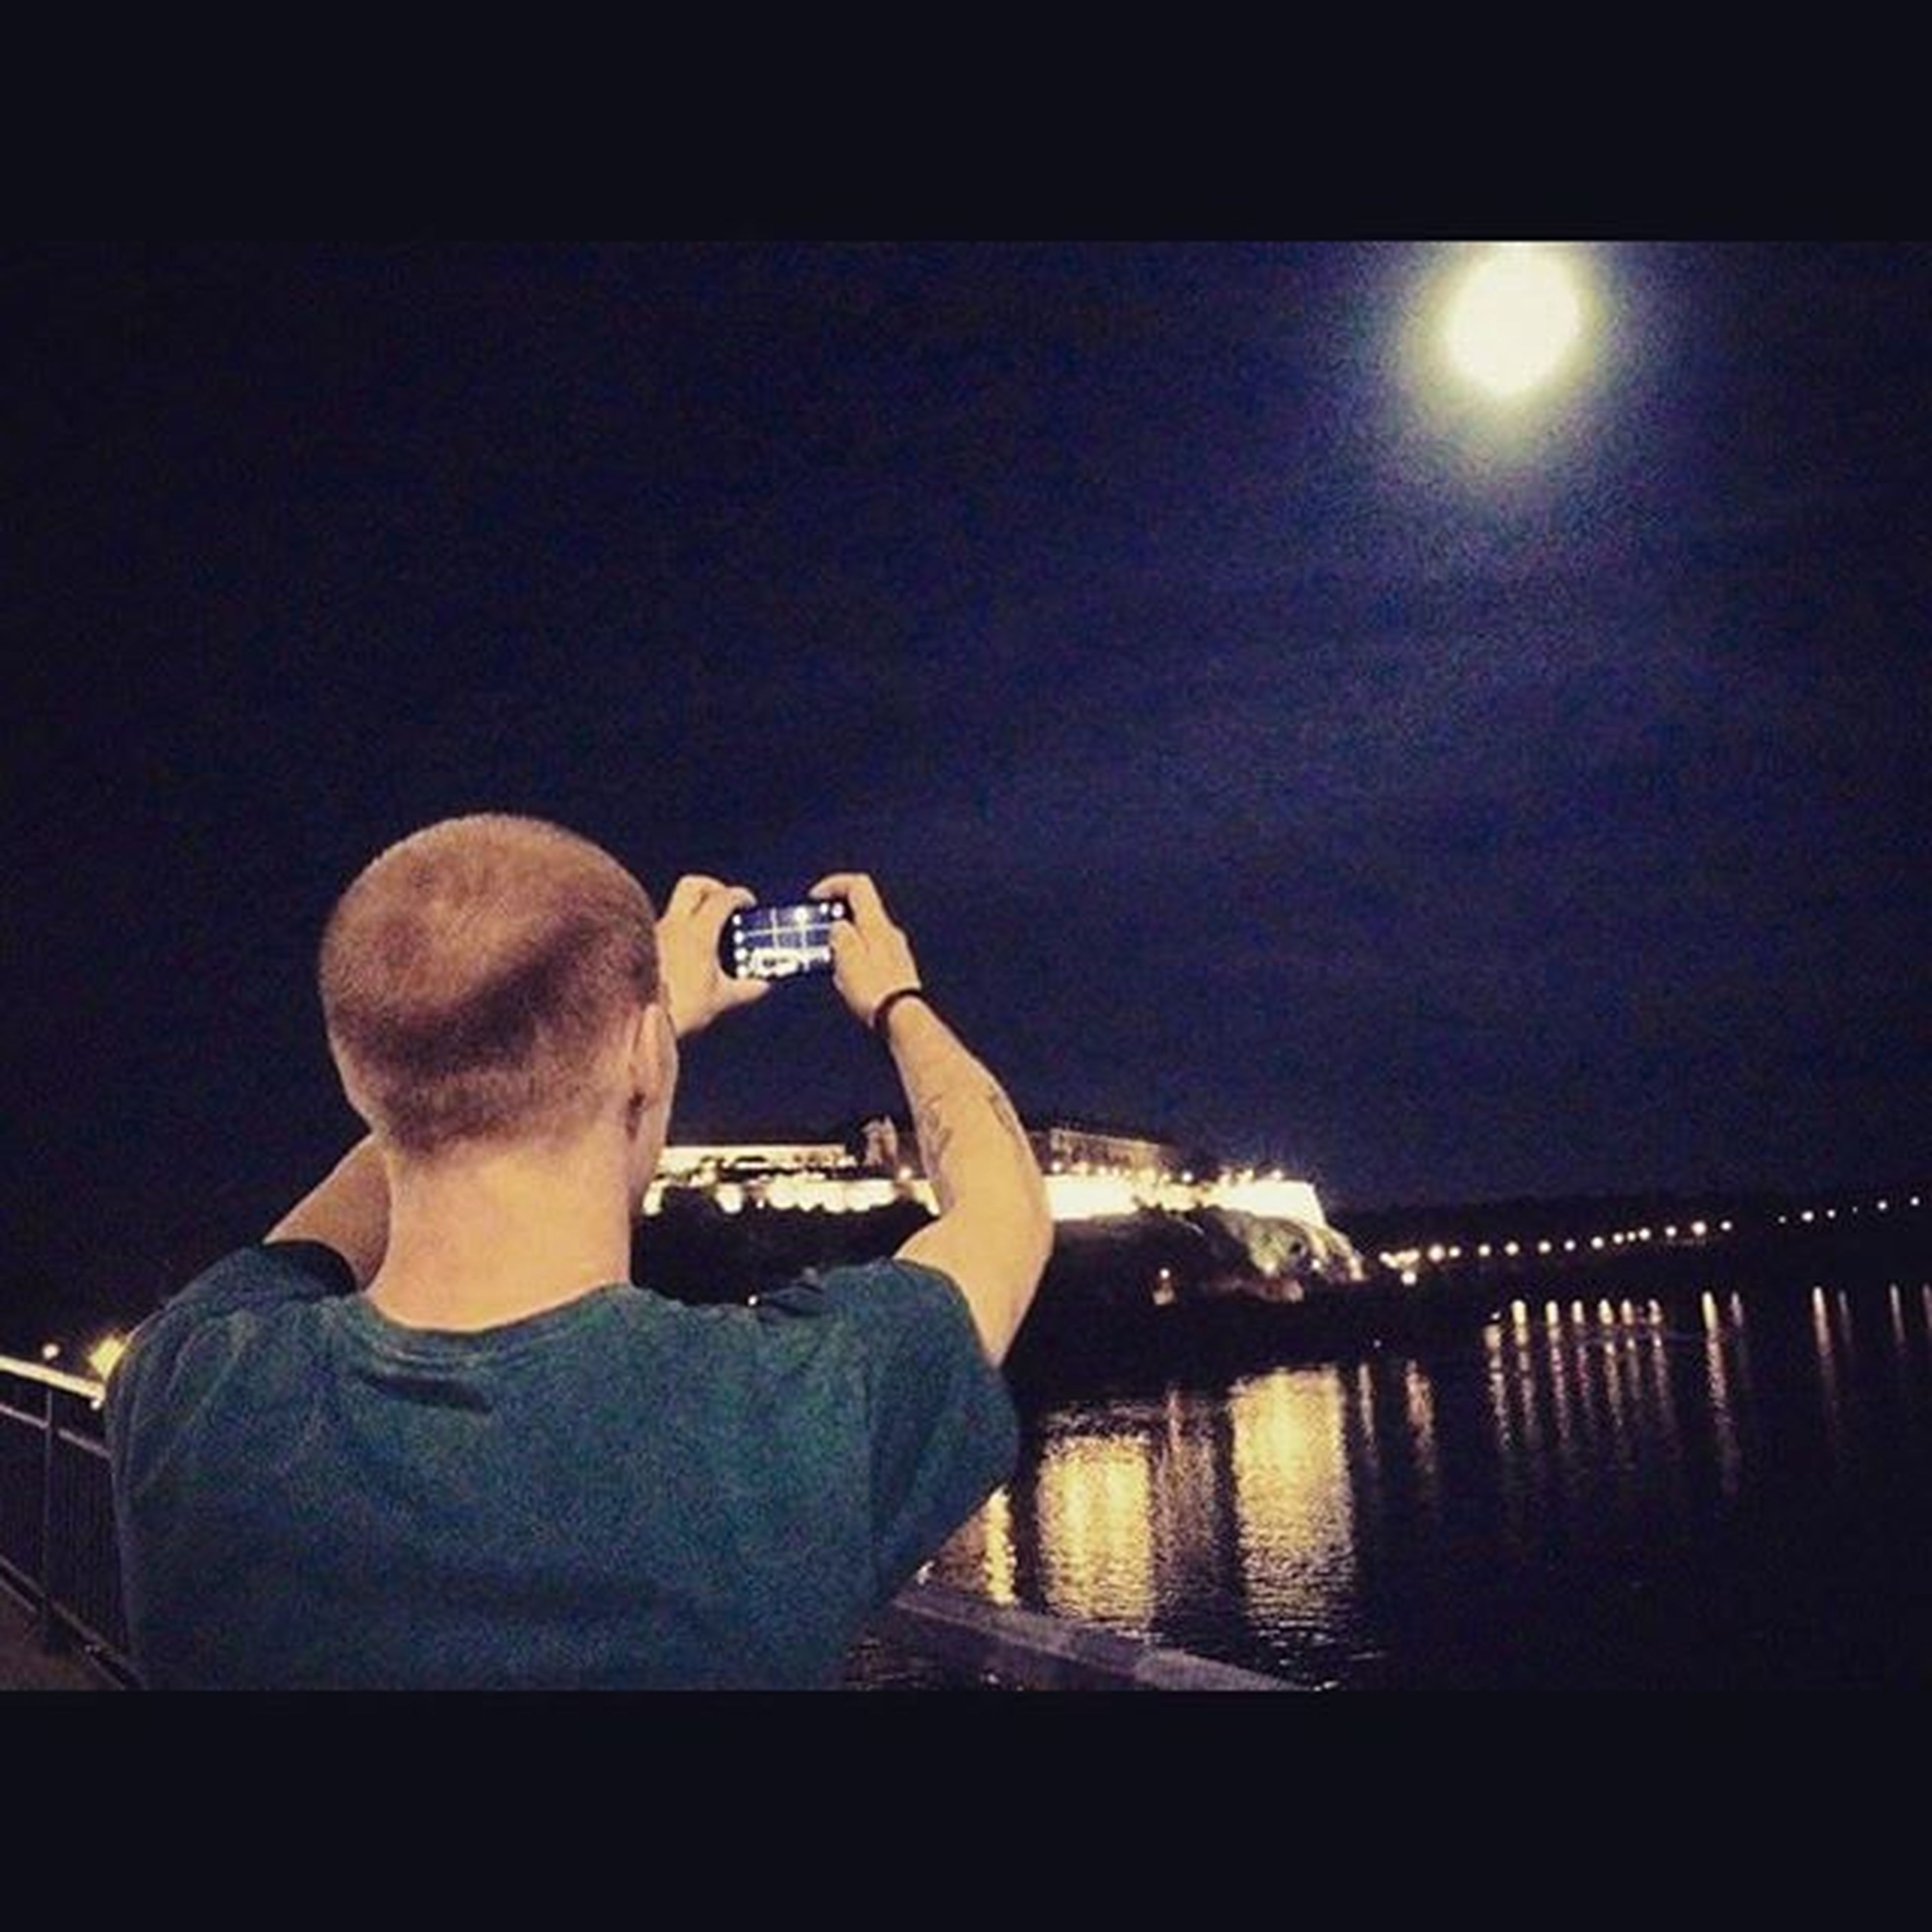 Sky Moon Light Tvrdjava Petrovaradinfortress Magical Photo Capture Danube Novisad Vjvodina Insta Instaphoto Instamoment Instadaily